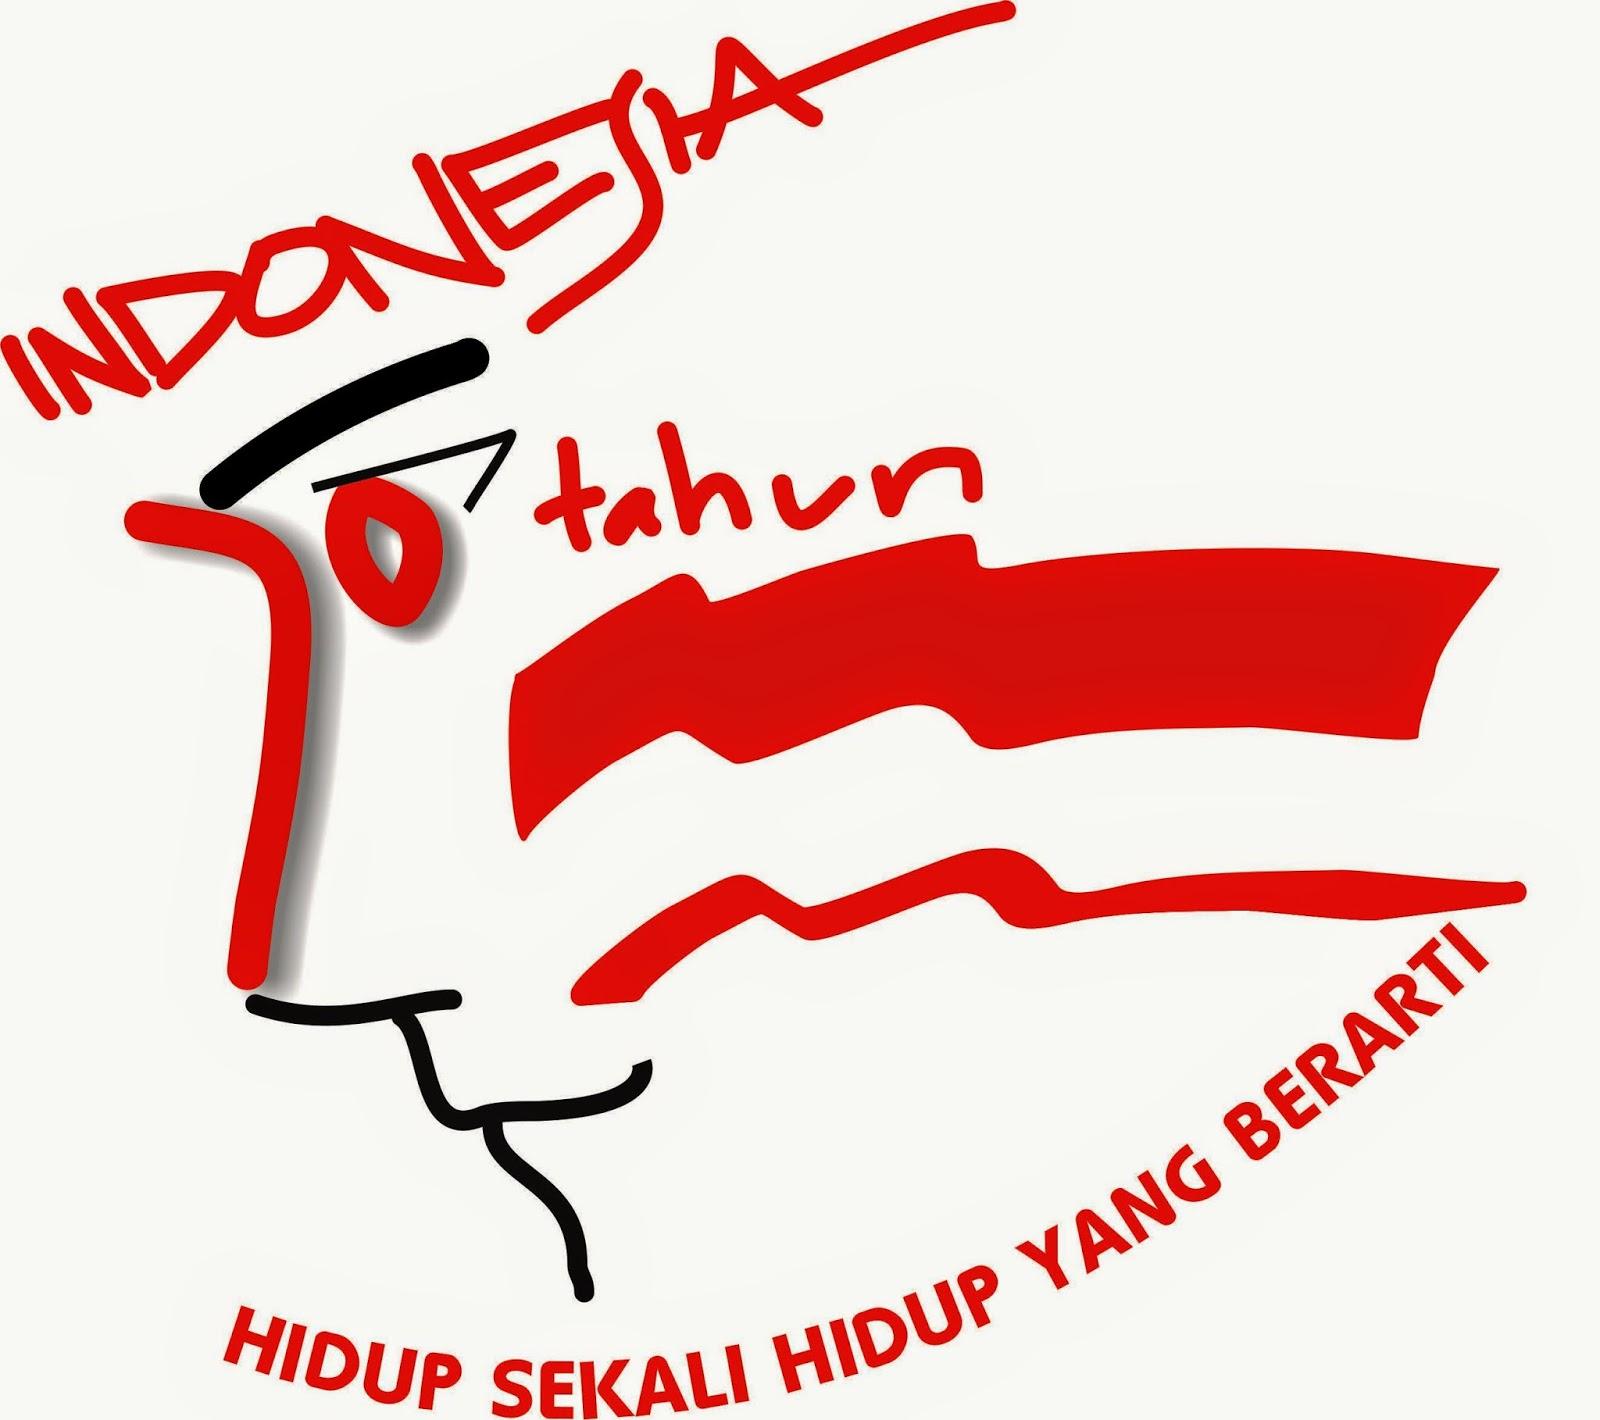 Karya Logo 70 Tahun Indonesia Merdeka ManNusantara Design Indonesia